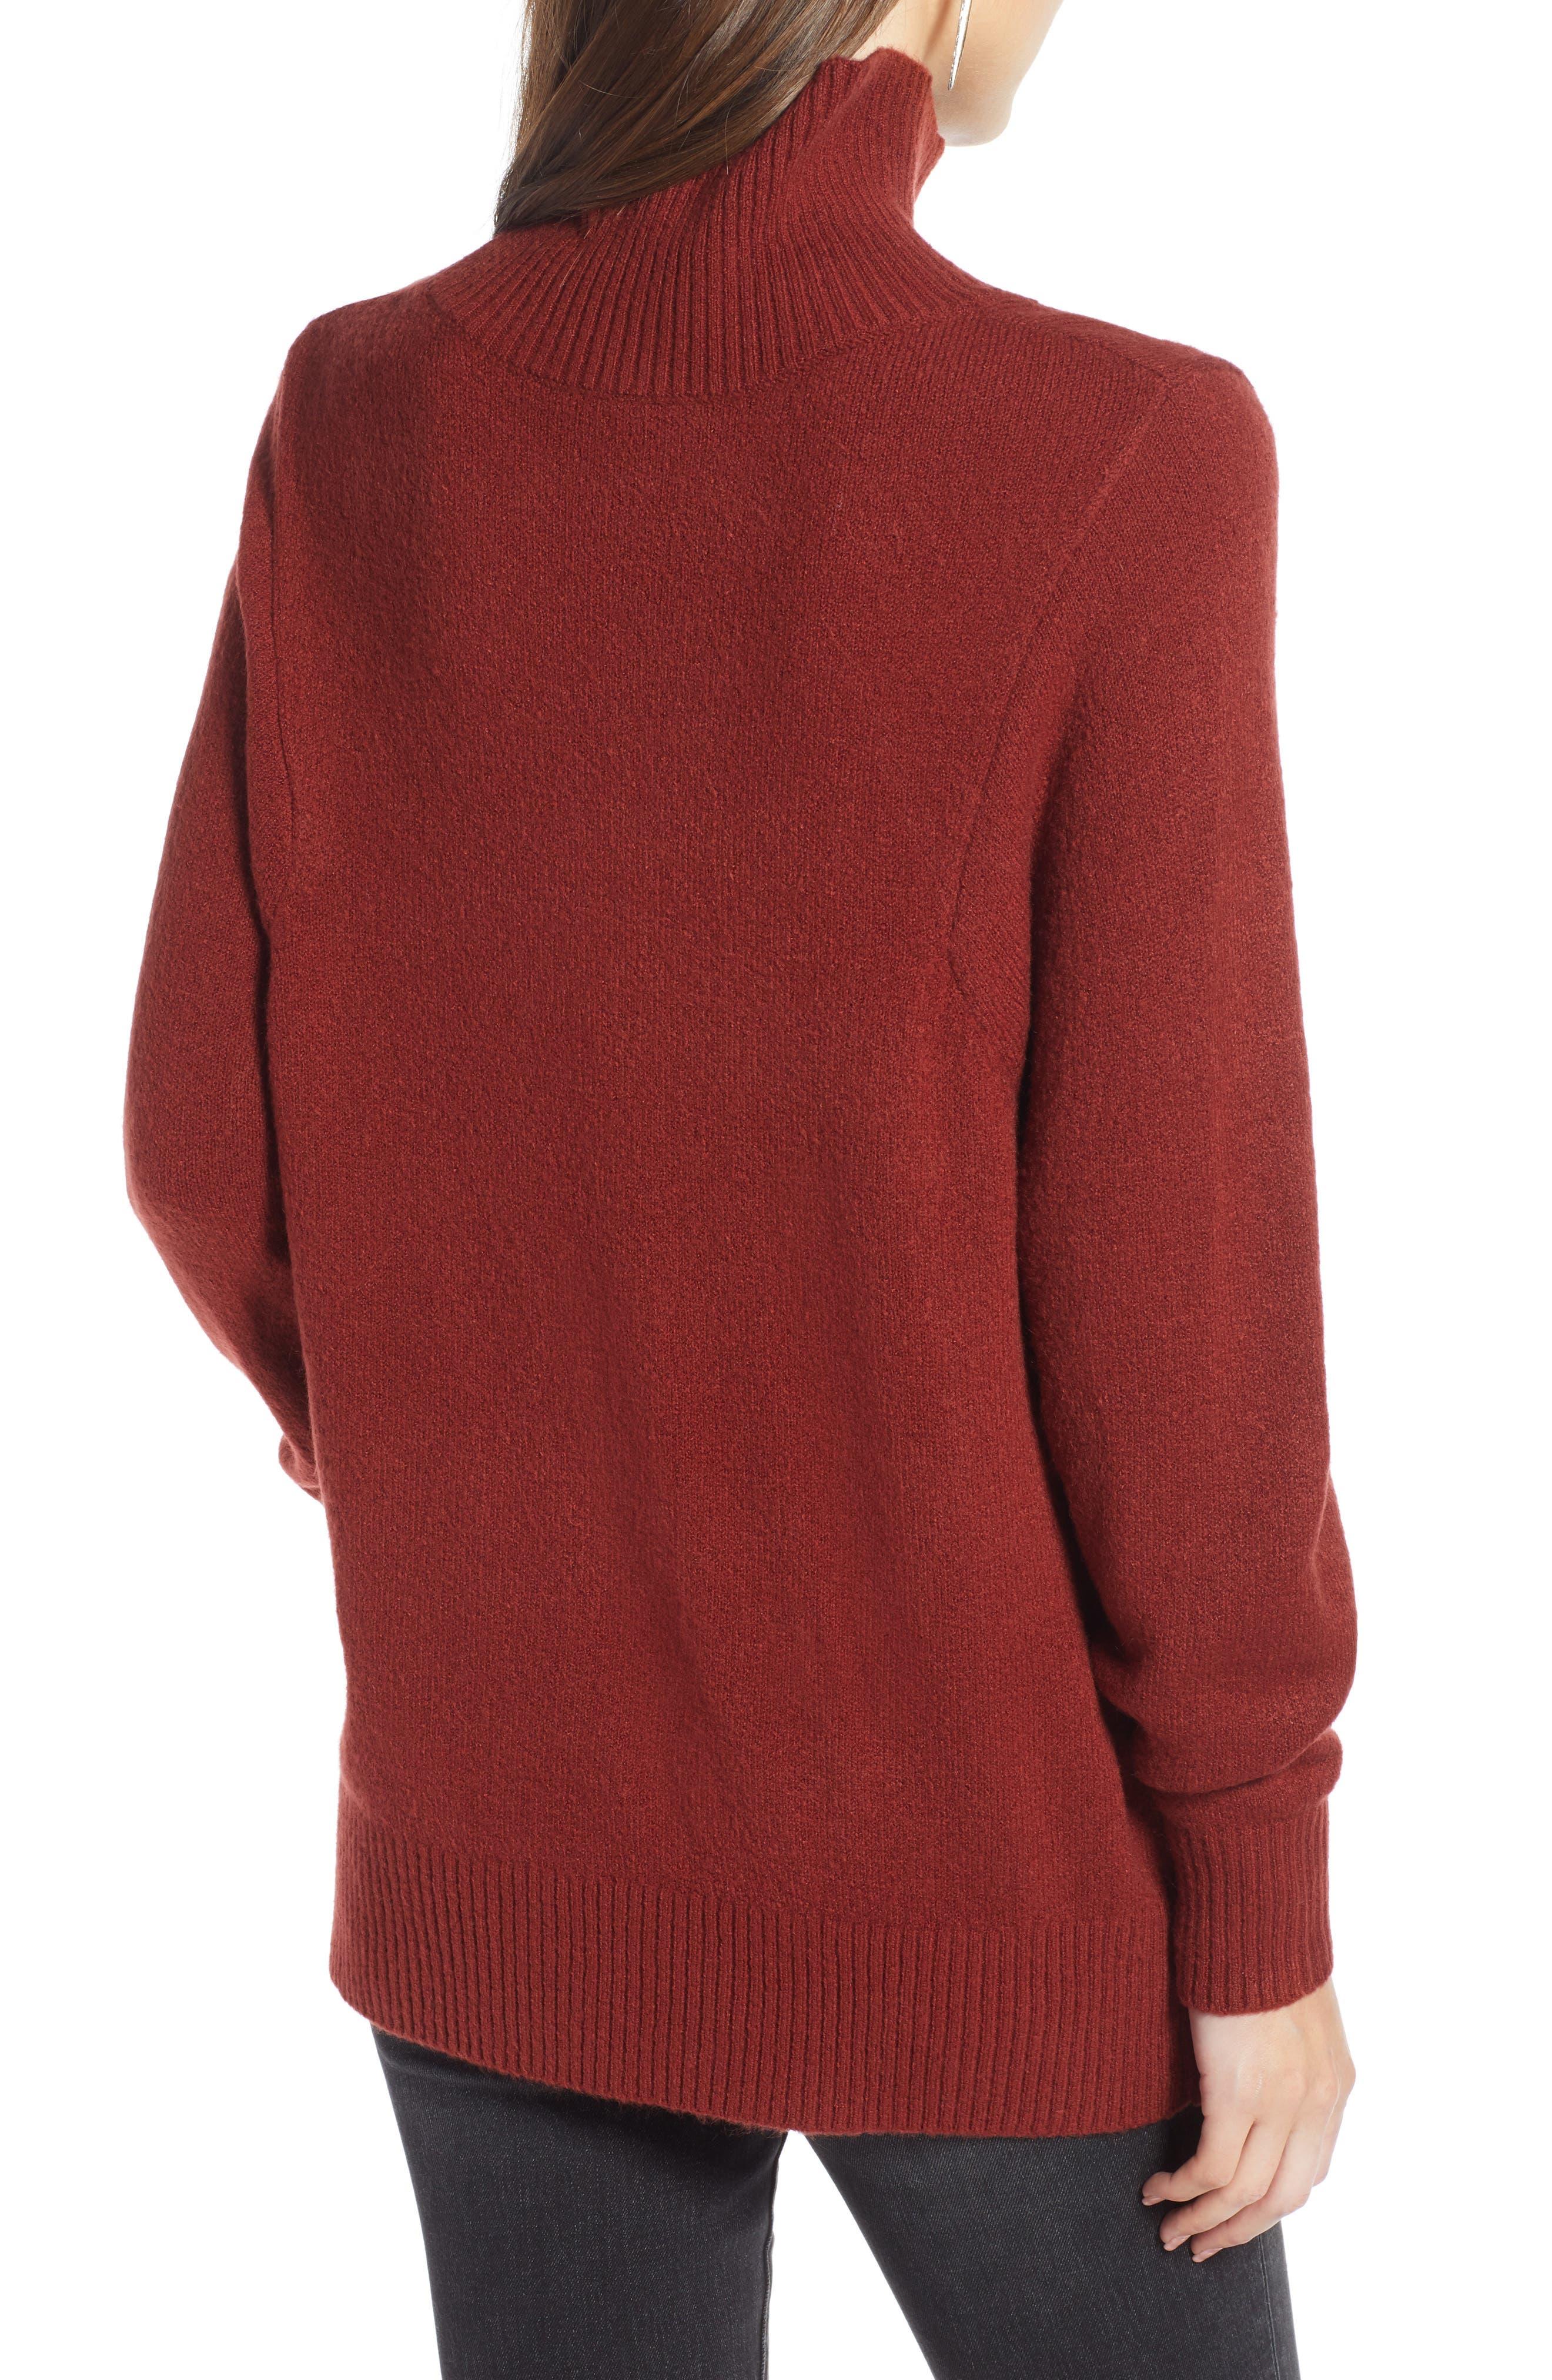 Seasonal Pullover Sweater,                             Alternate thumbnail 2, color,                             BURGUNDY RUSSET